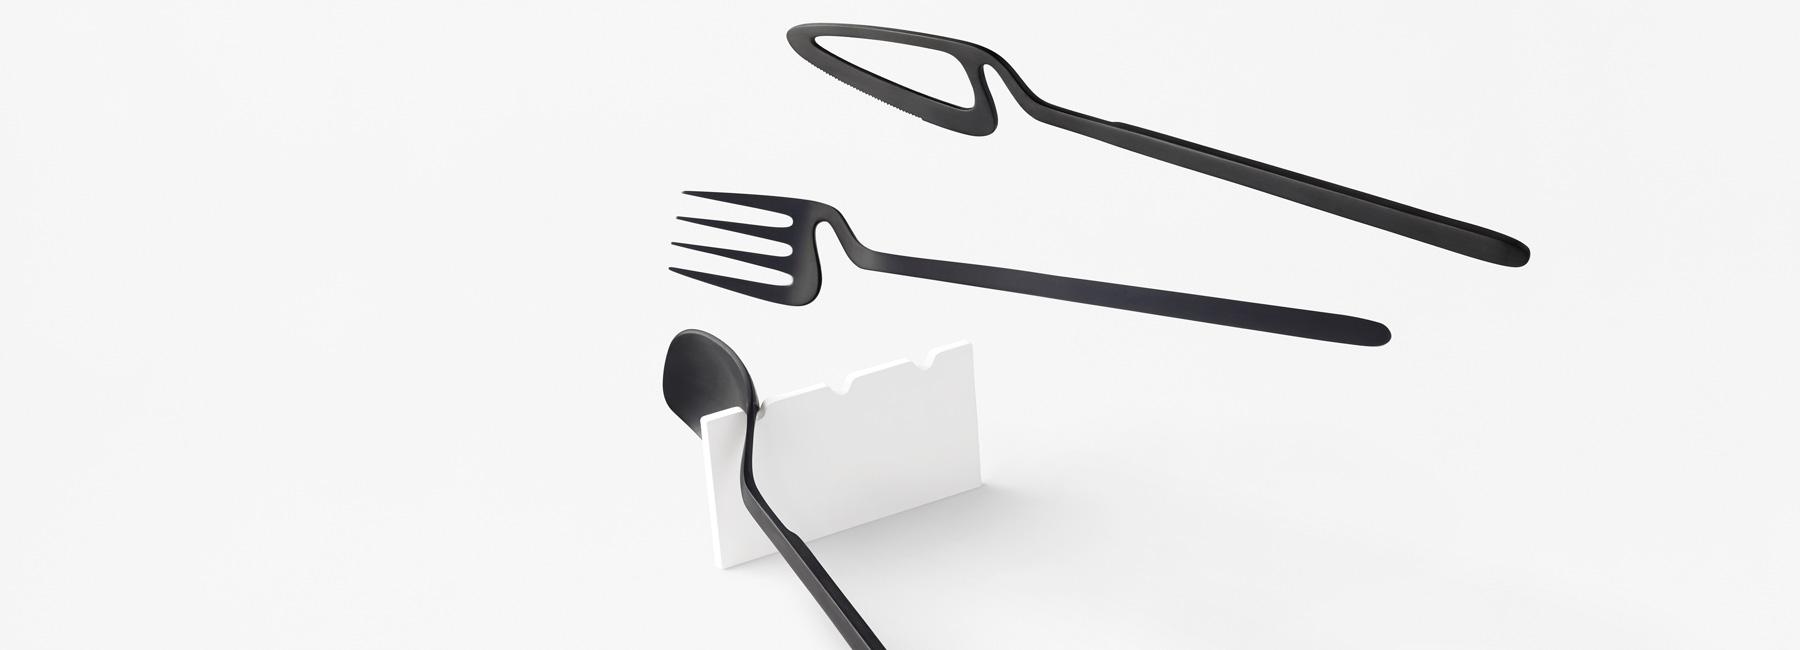 طراحی خلاقانه سرویس قاشق و چنگال